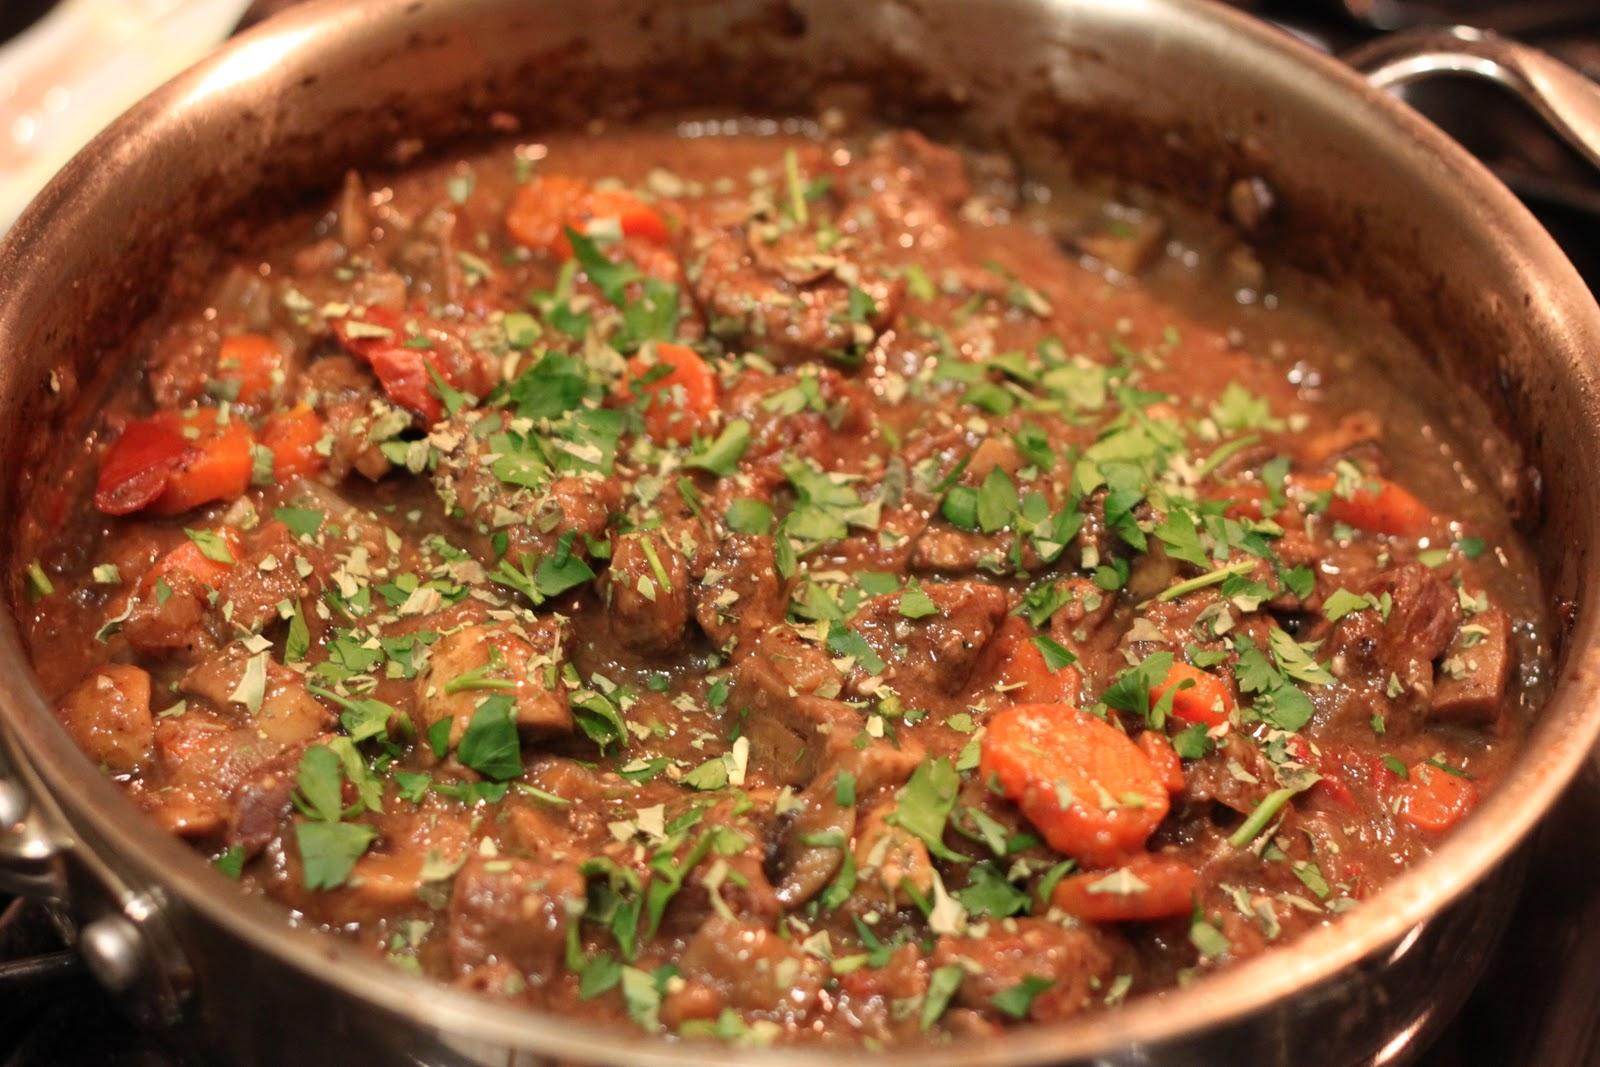 Meghalicious: Italian Beef Stew